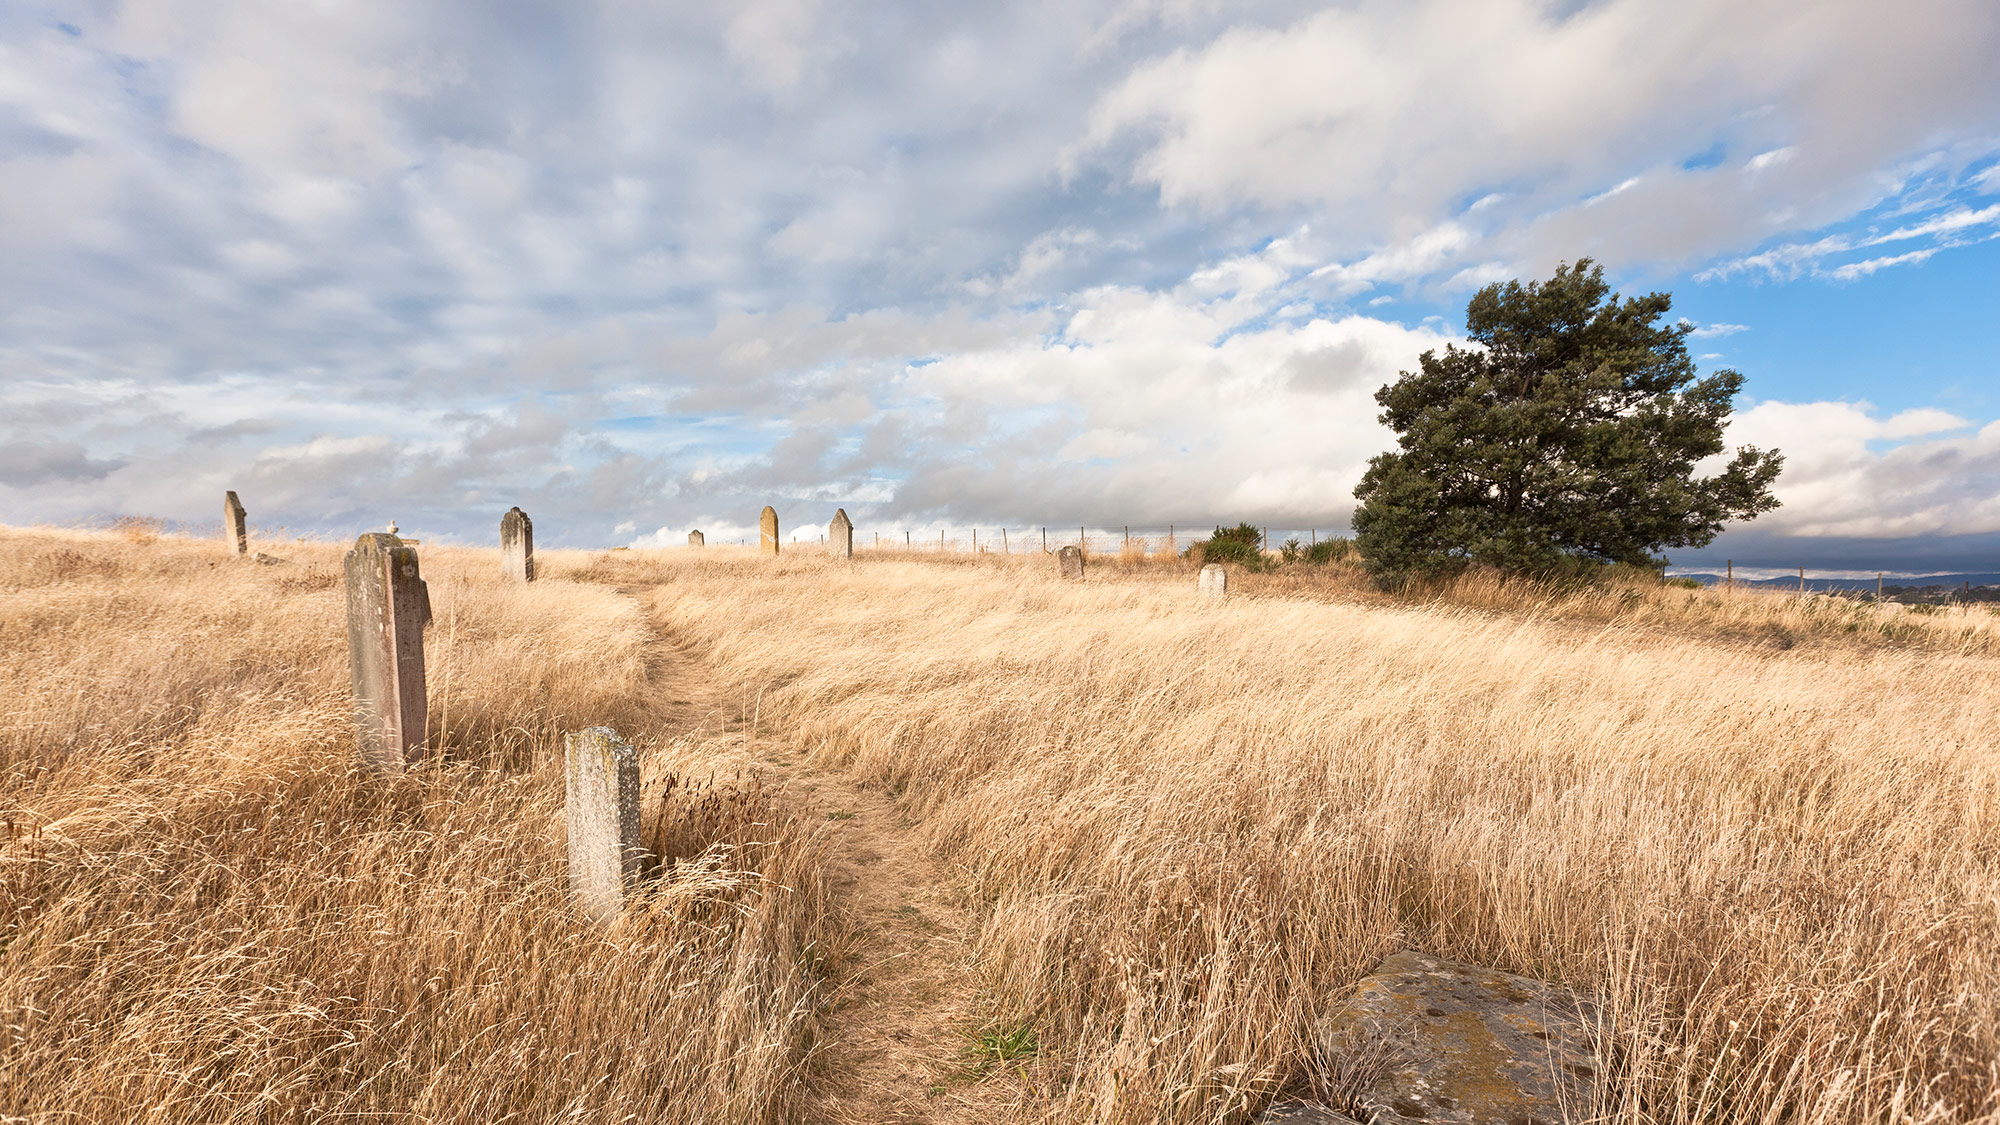 Gravestones on a grassy field